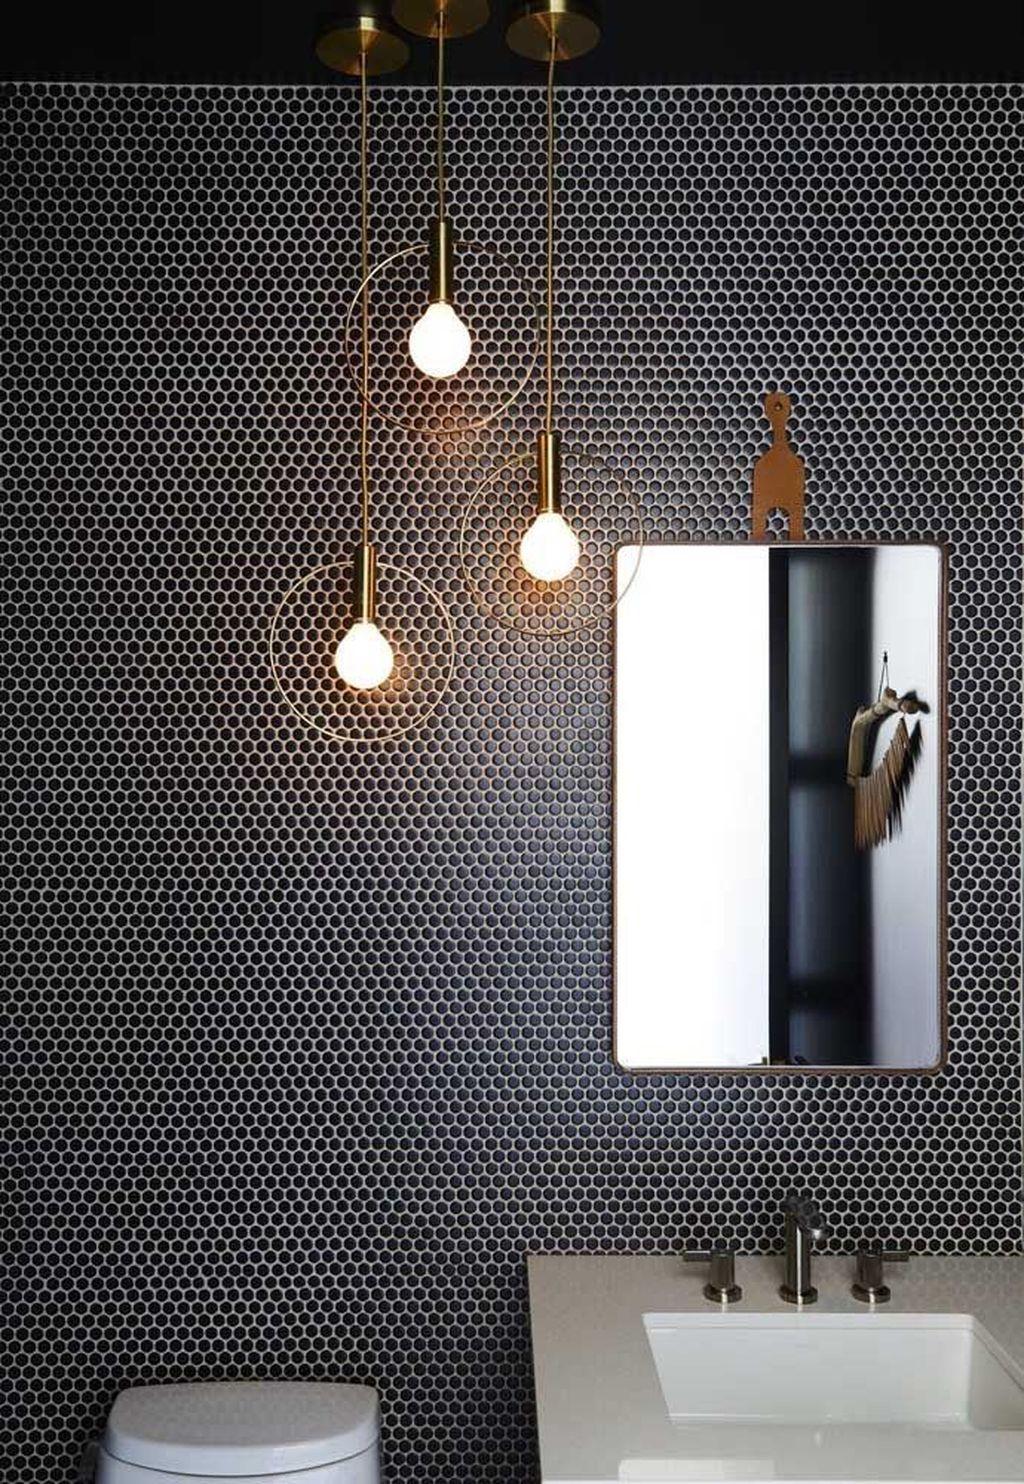 Inspiring Black Powder Room Design Ideas With Modern Style 27